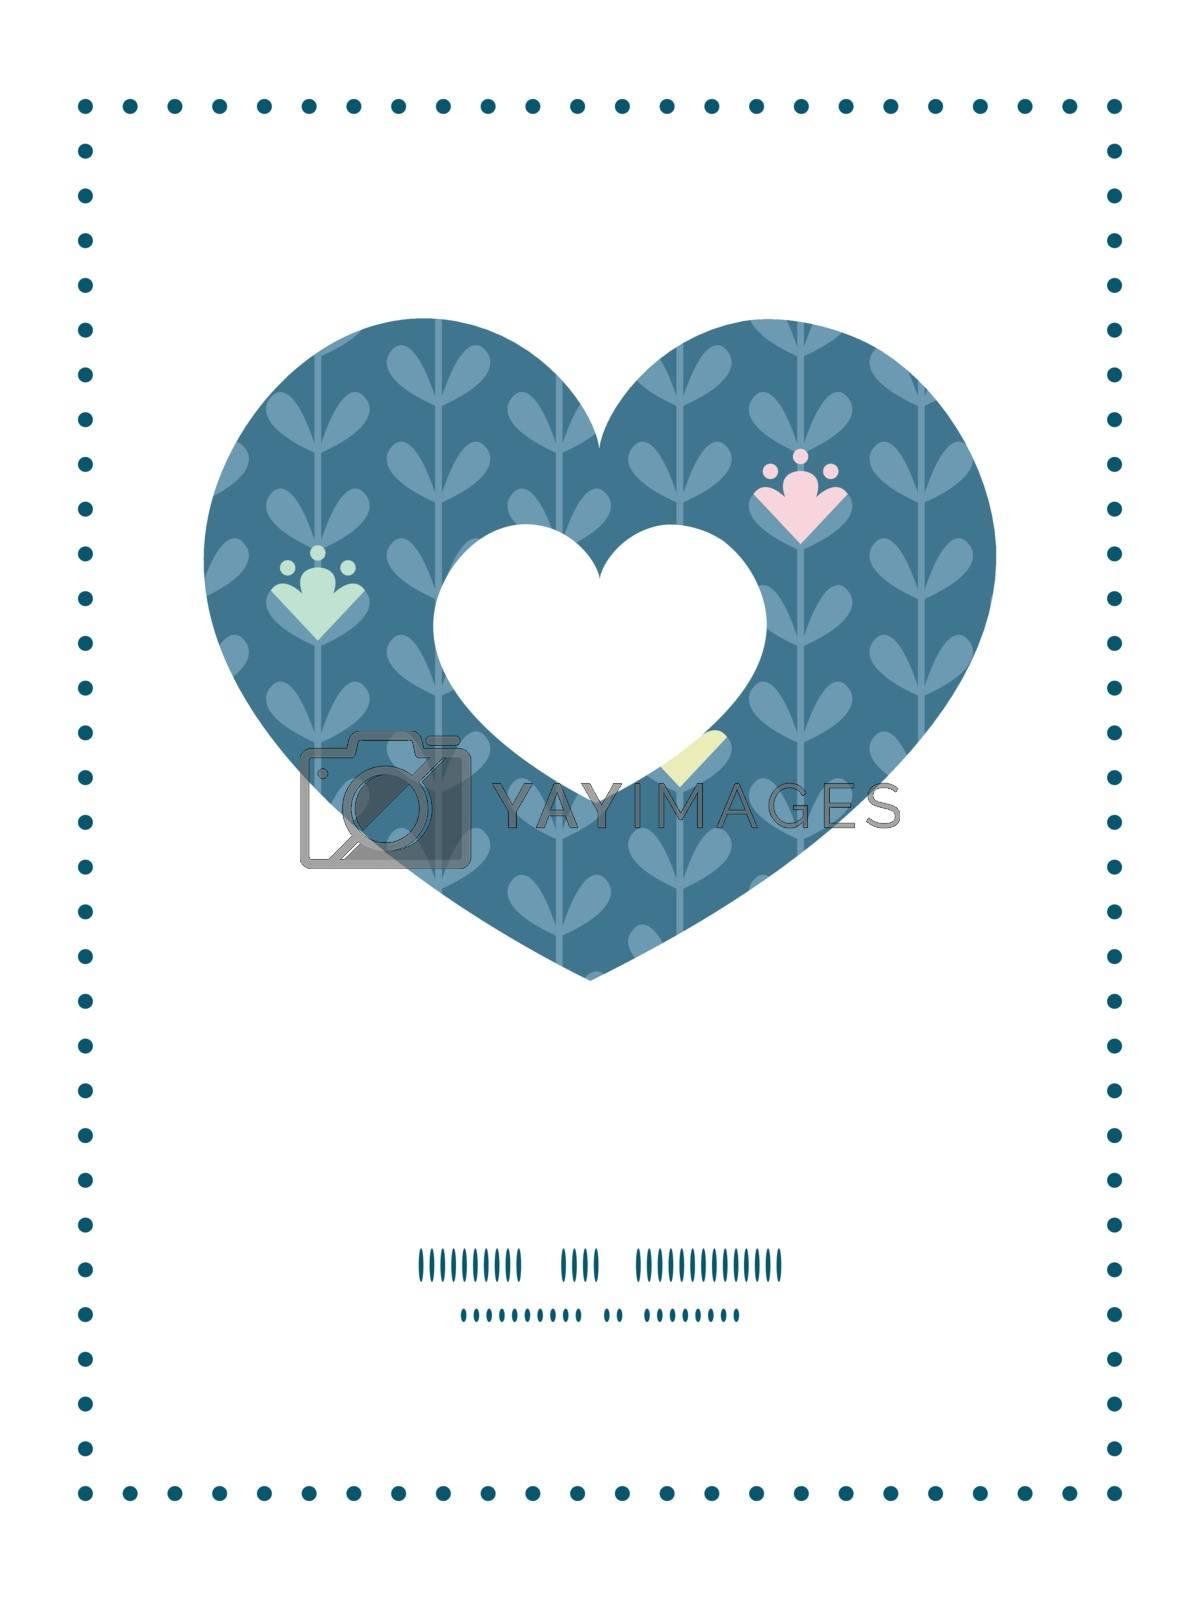 Vector blloming vines stripes heart symbol frame pattern invitation greeting card template graphic design